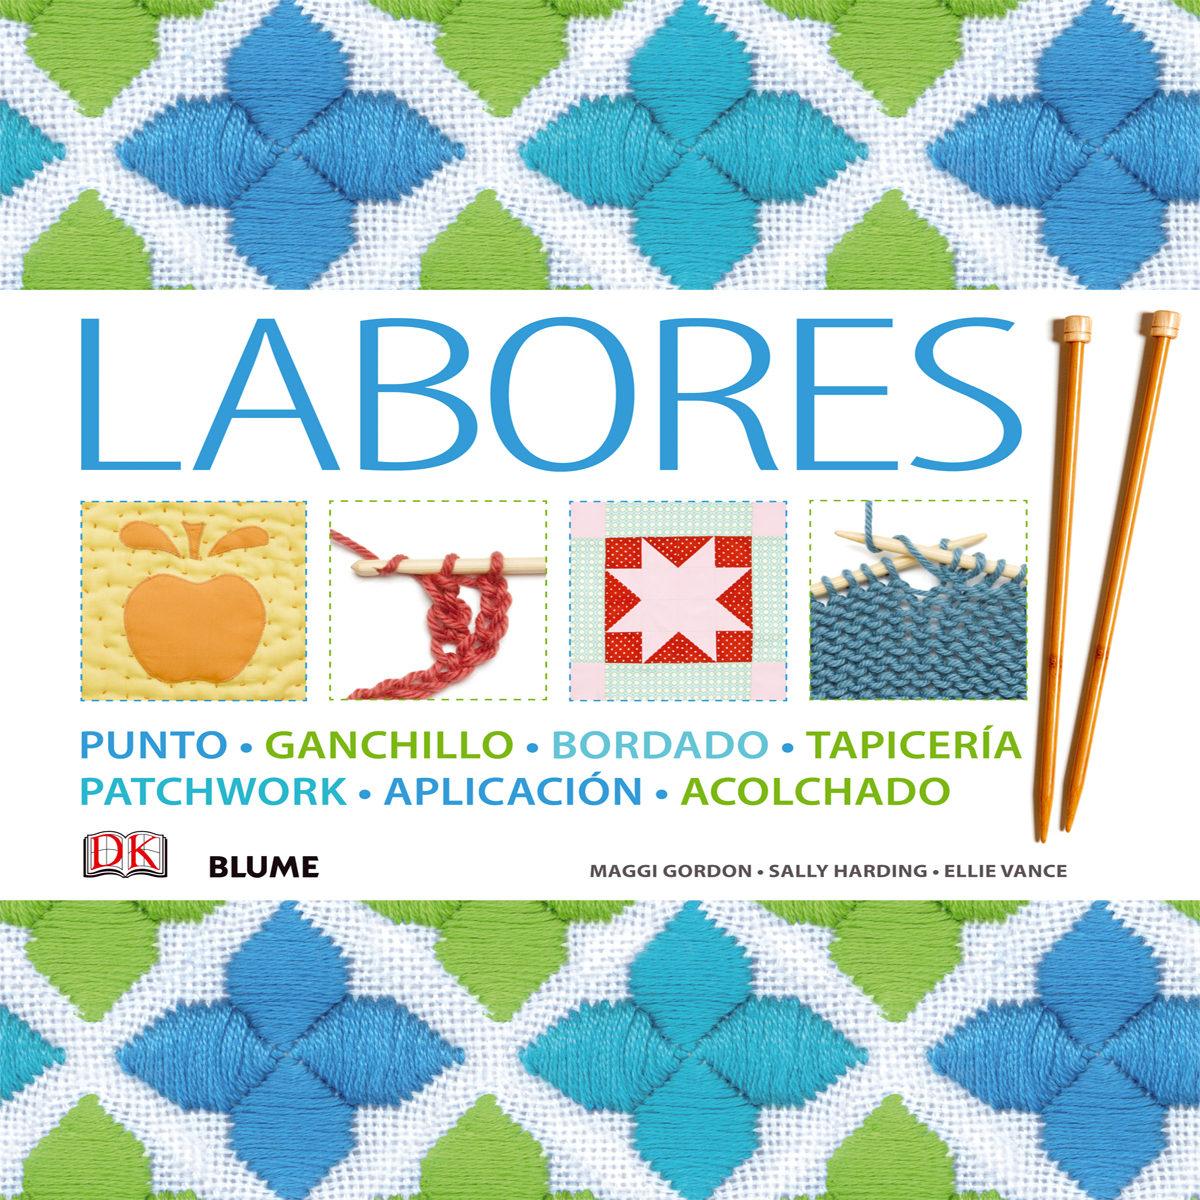 LABORES: PUNTO, GANCHILLO, BORDADO, TAPICERIA, PATCHWORK, APLICACION ...